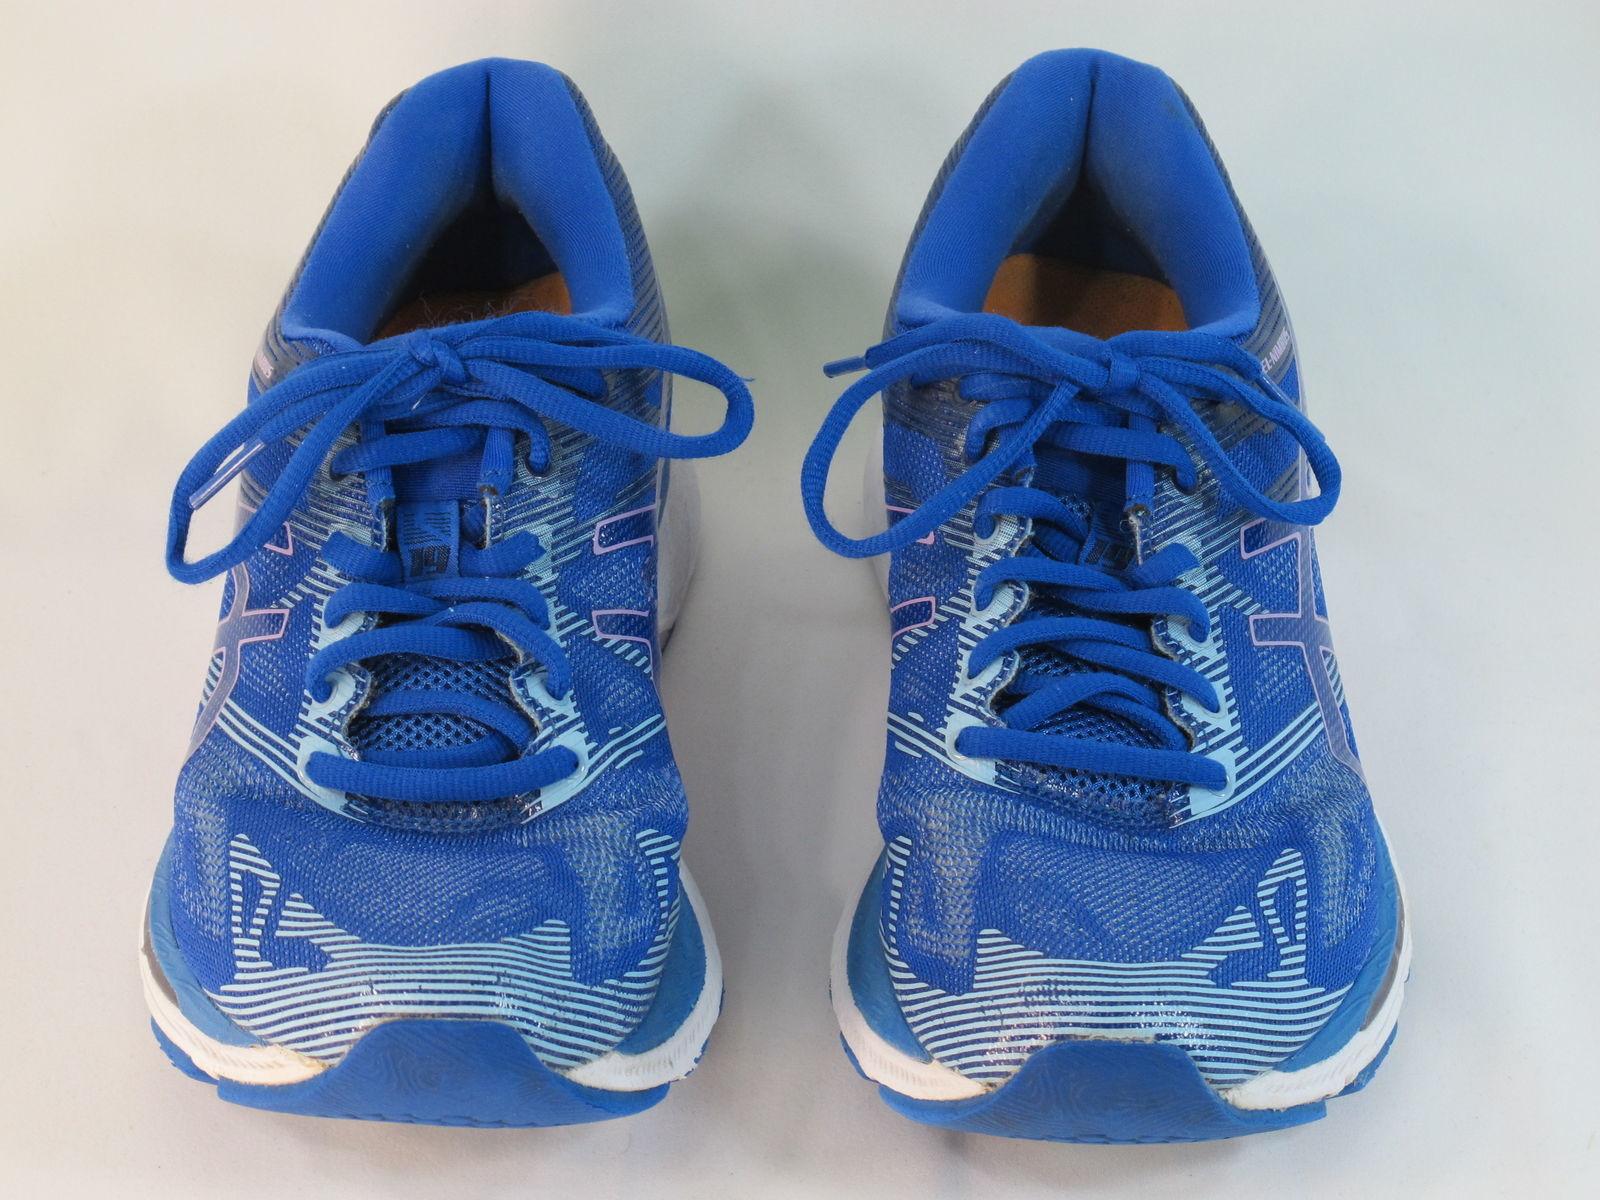 Asics Gel Nimbus 19 Women's Running Shoes and 50 similar items